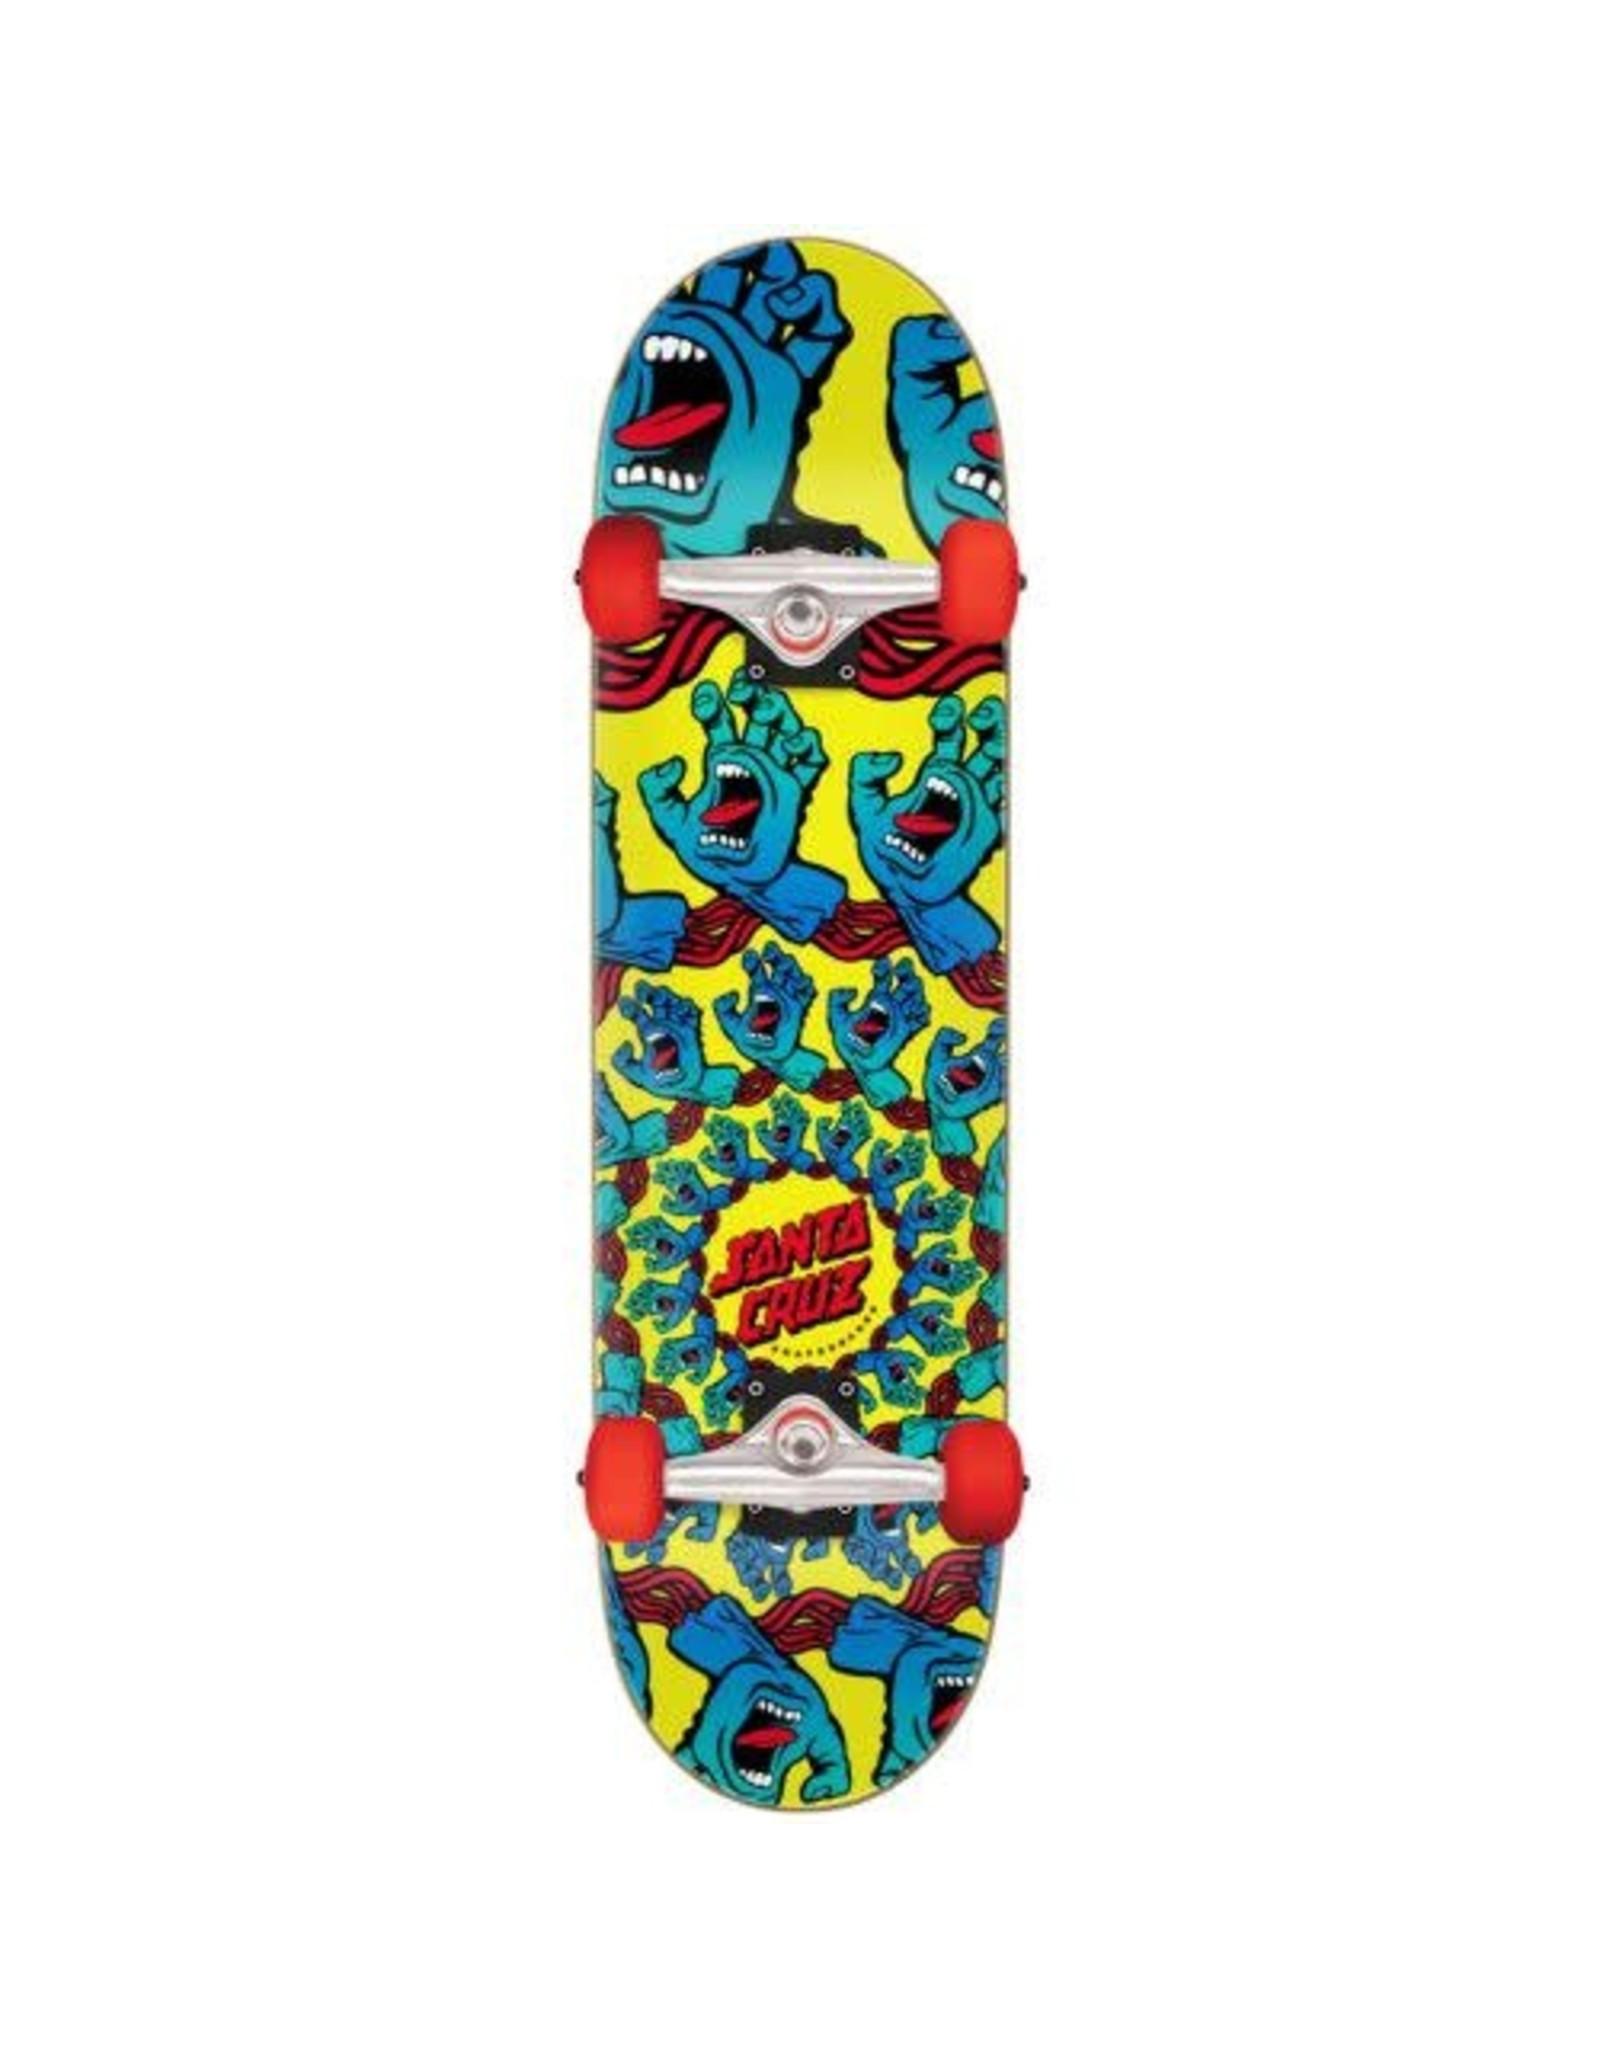 Santa Cruz Mandala Hand Large Complete Skateboard